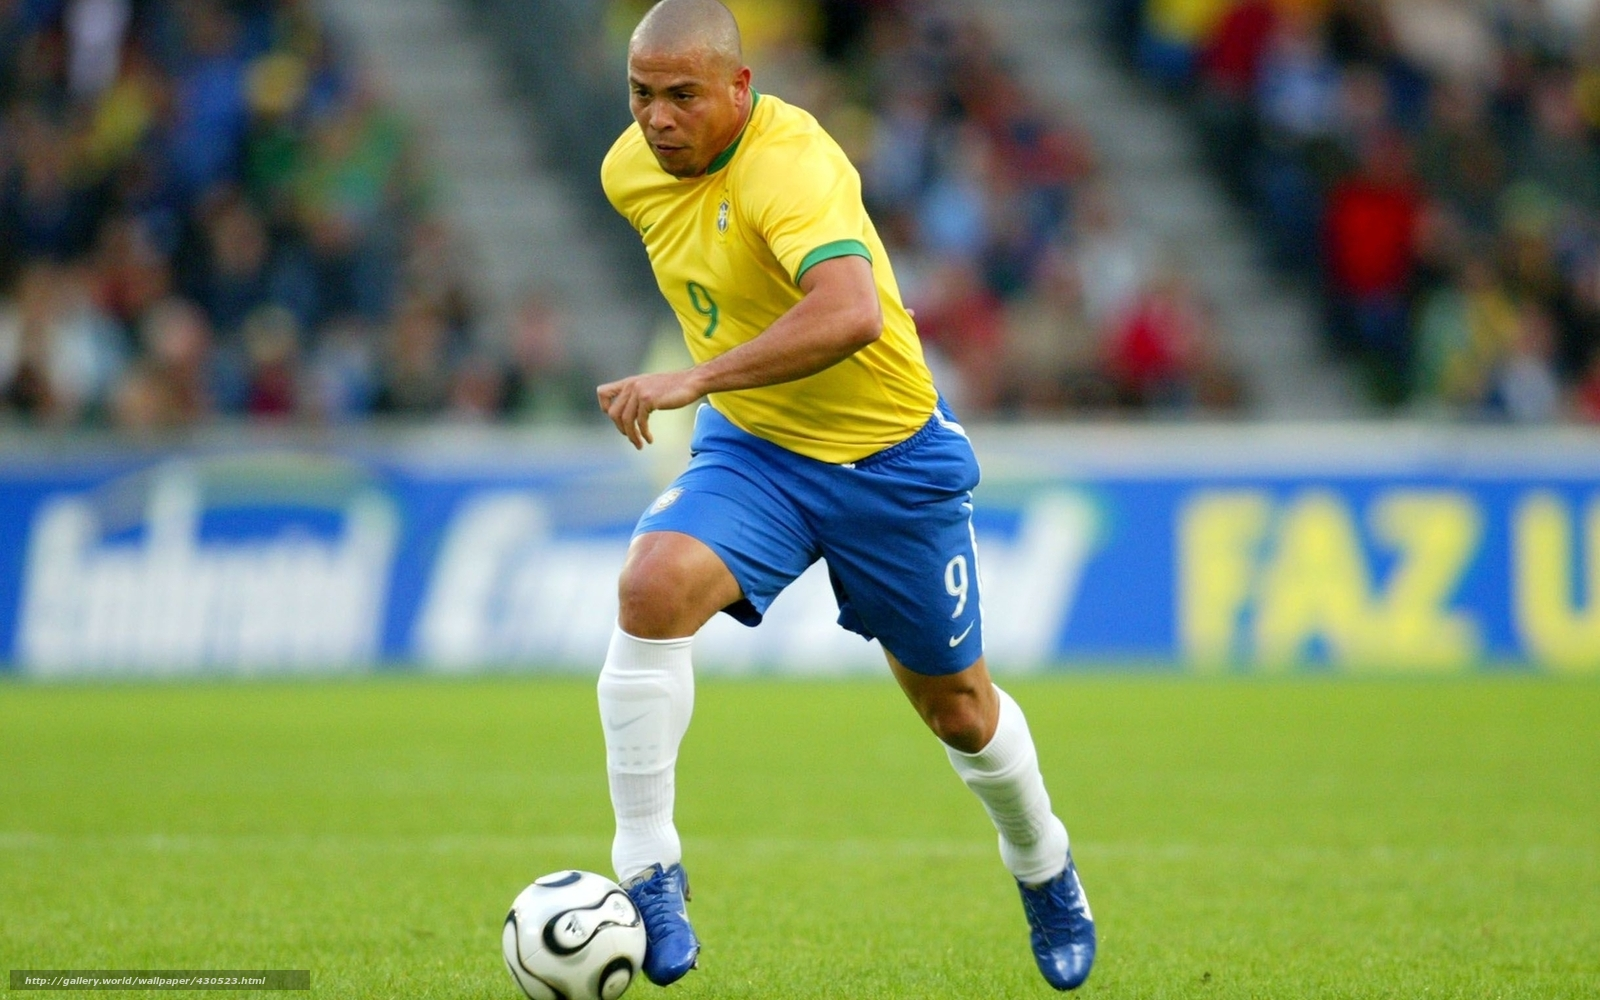 Tapete Stern Legende Fuballer Brasilien Nationalmannschaft Ronaldo Luis Nazario Ja Lima